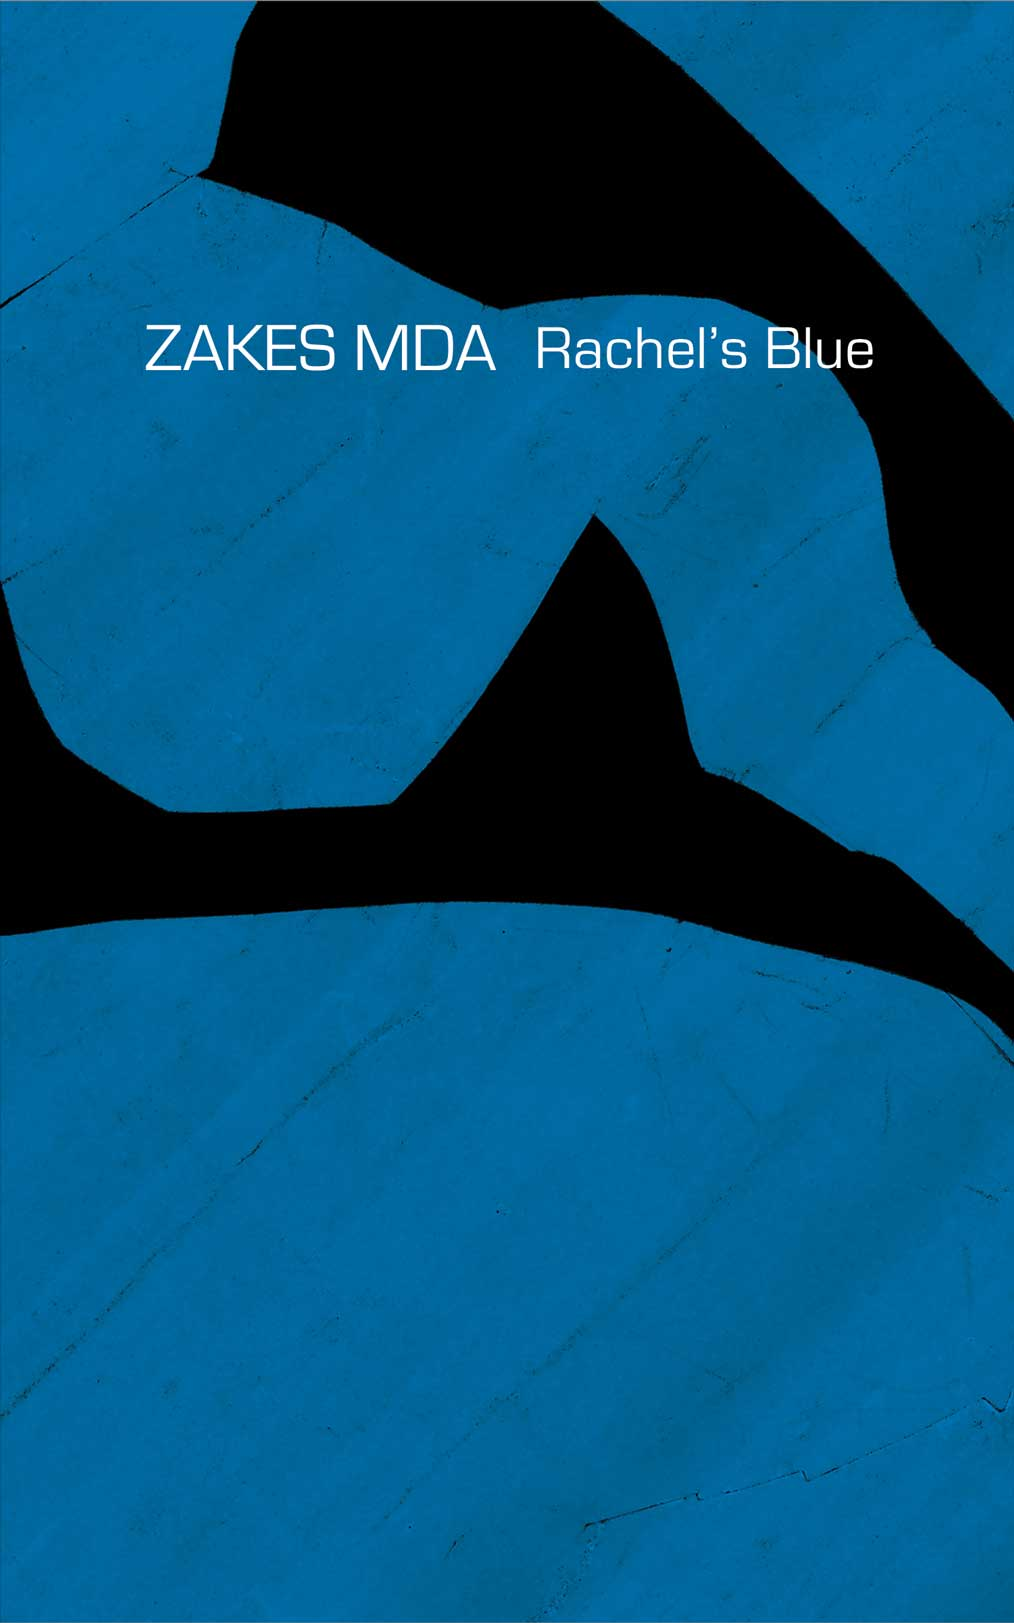 Rachel's Blue by Zakes Mda | Seagull Books